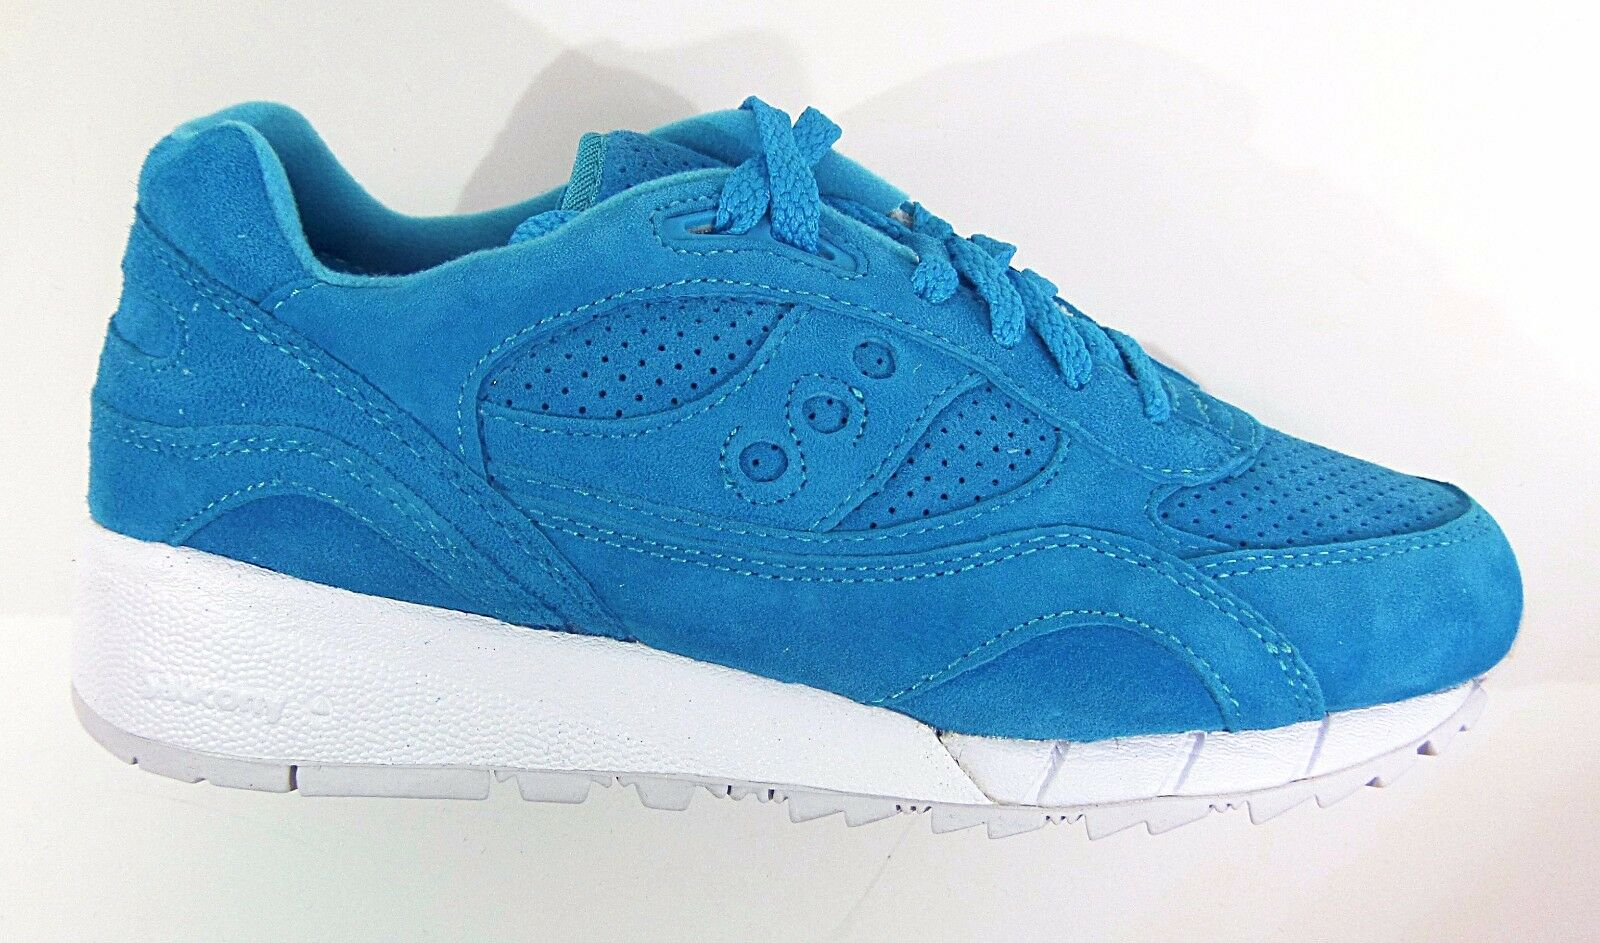 Saucony Men's Shadow 6000 Suede shoes bluee S70222-4 a